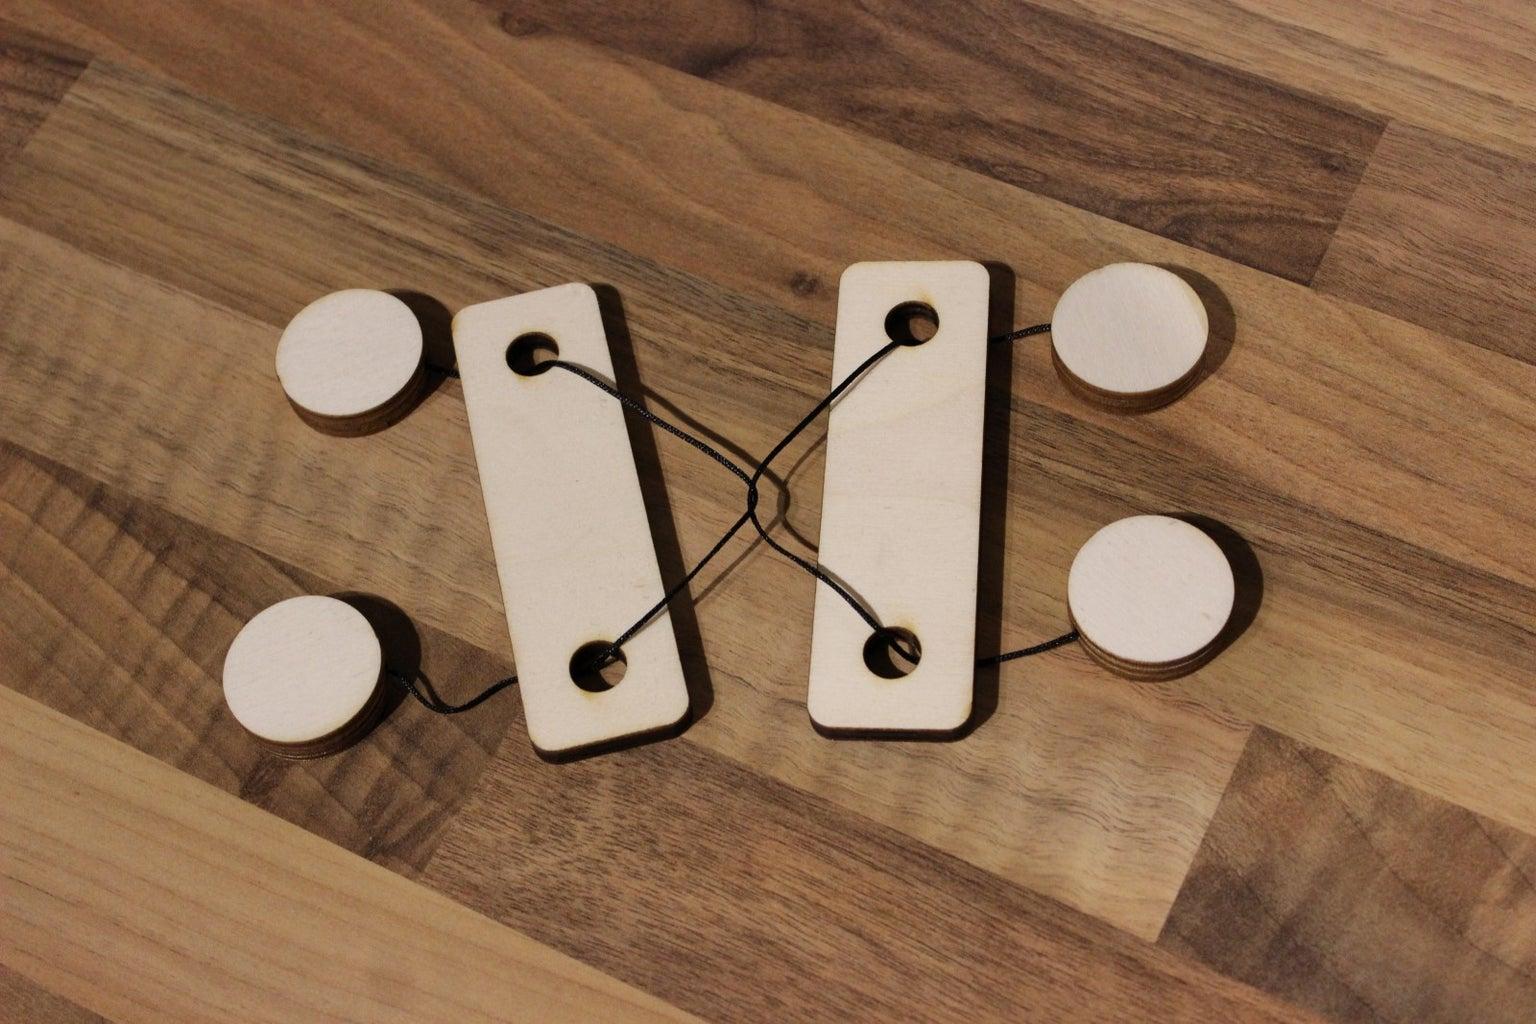 Disentanglement Puzzles